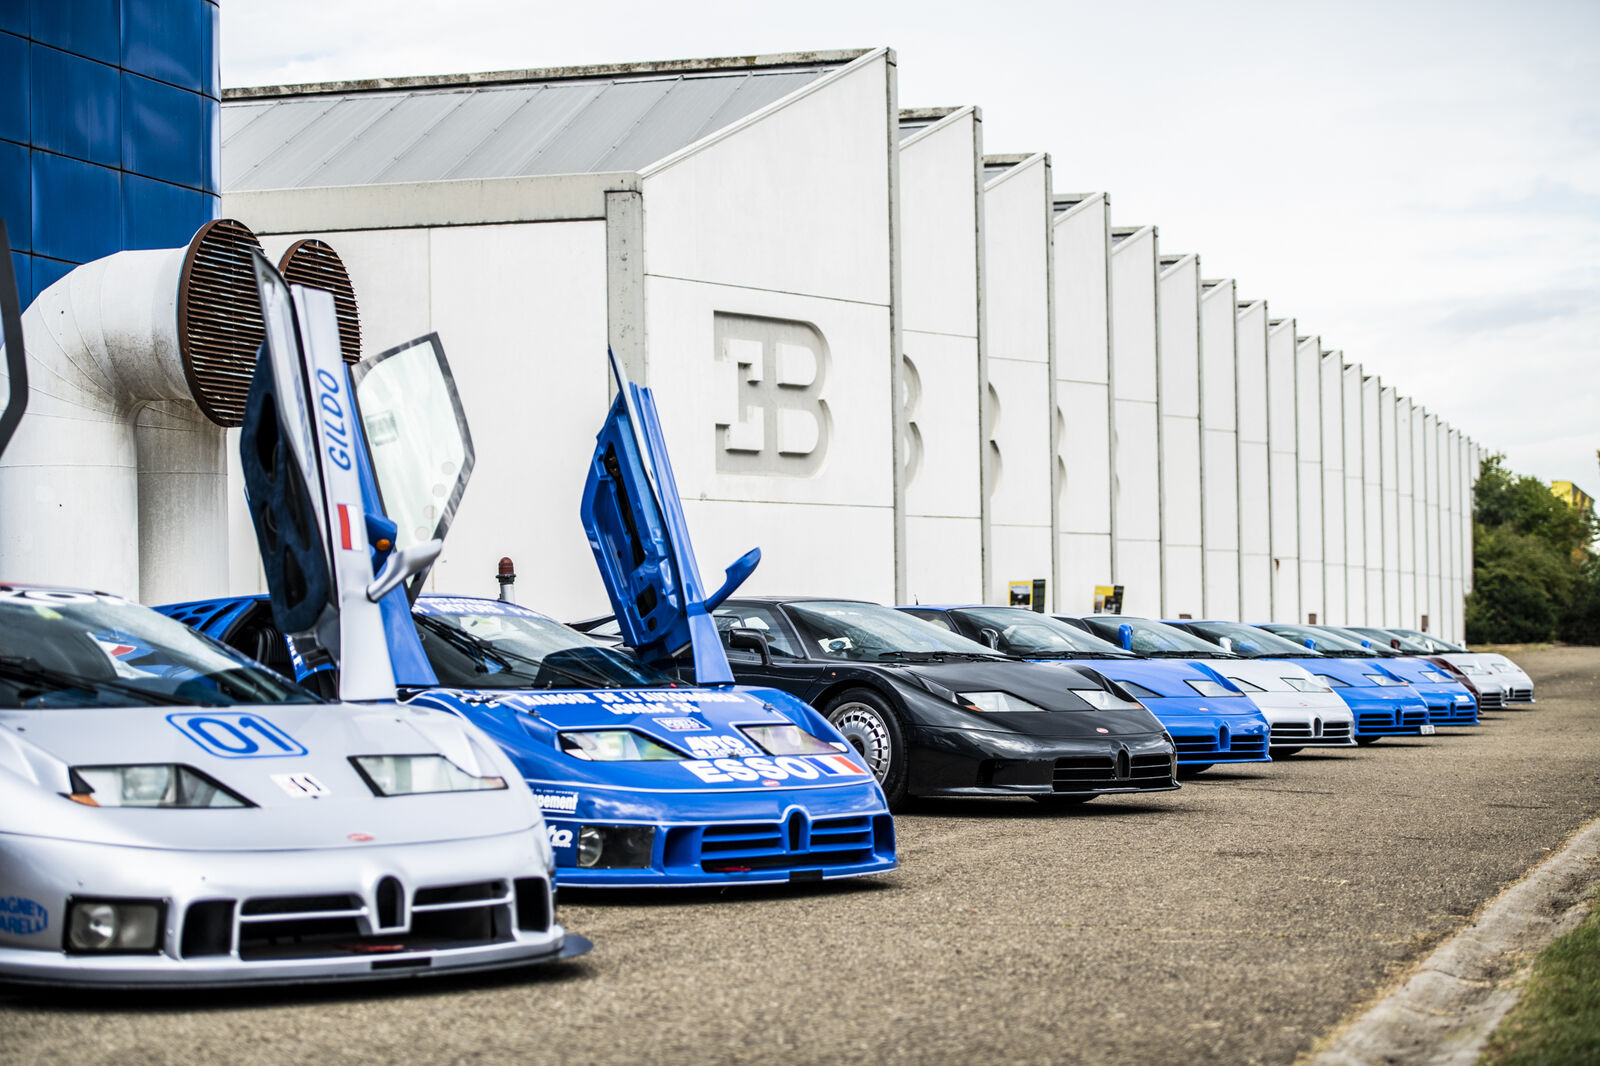 Il y a 30 ans, le monde découvrait la Bugatti EB 110